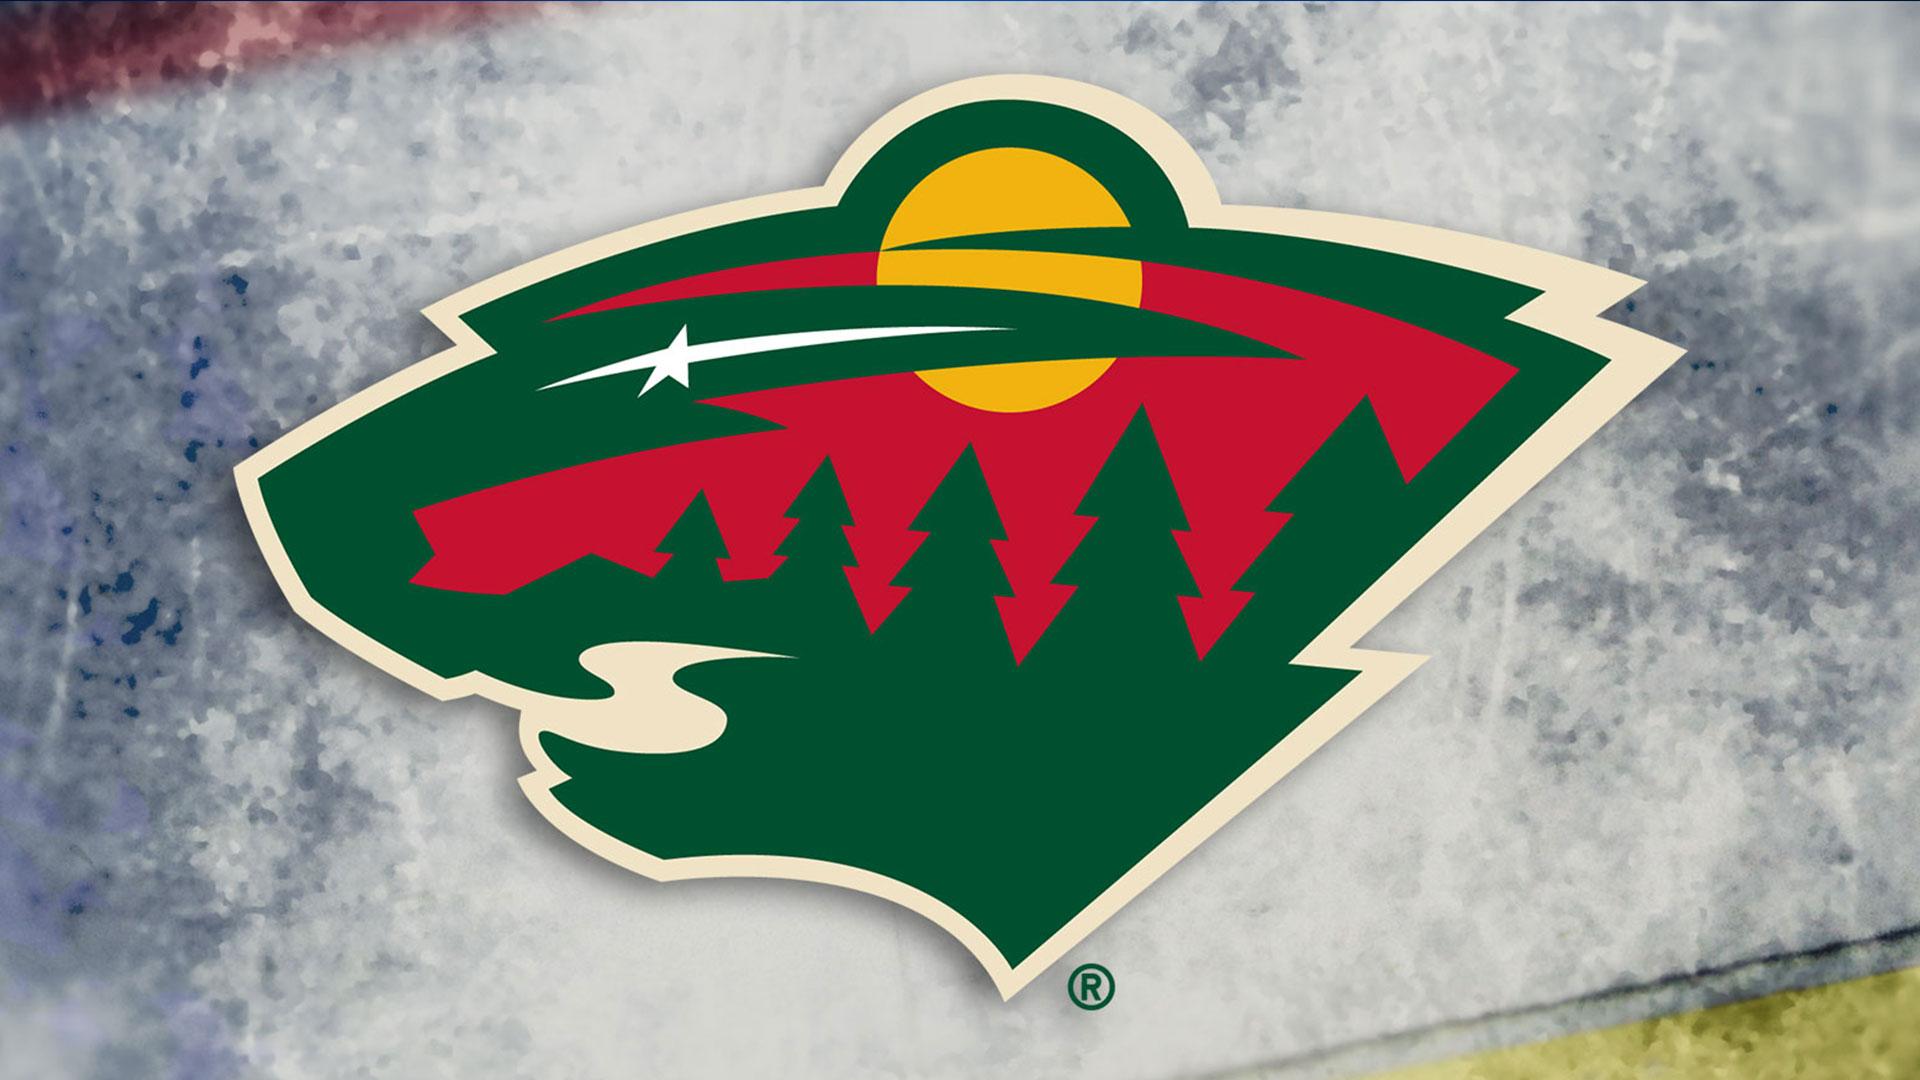 KELO Minnesota Wild